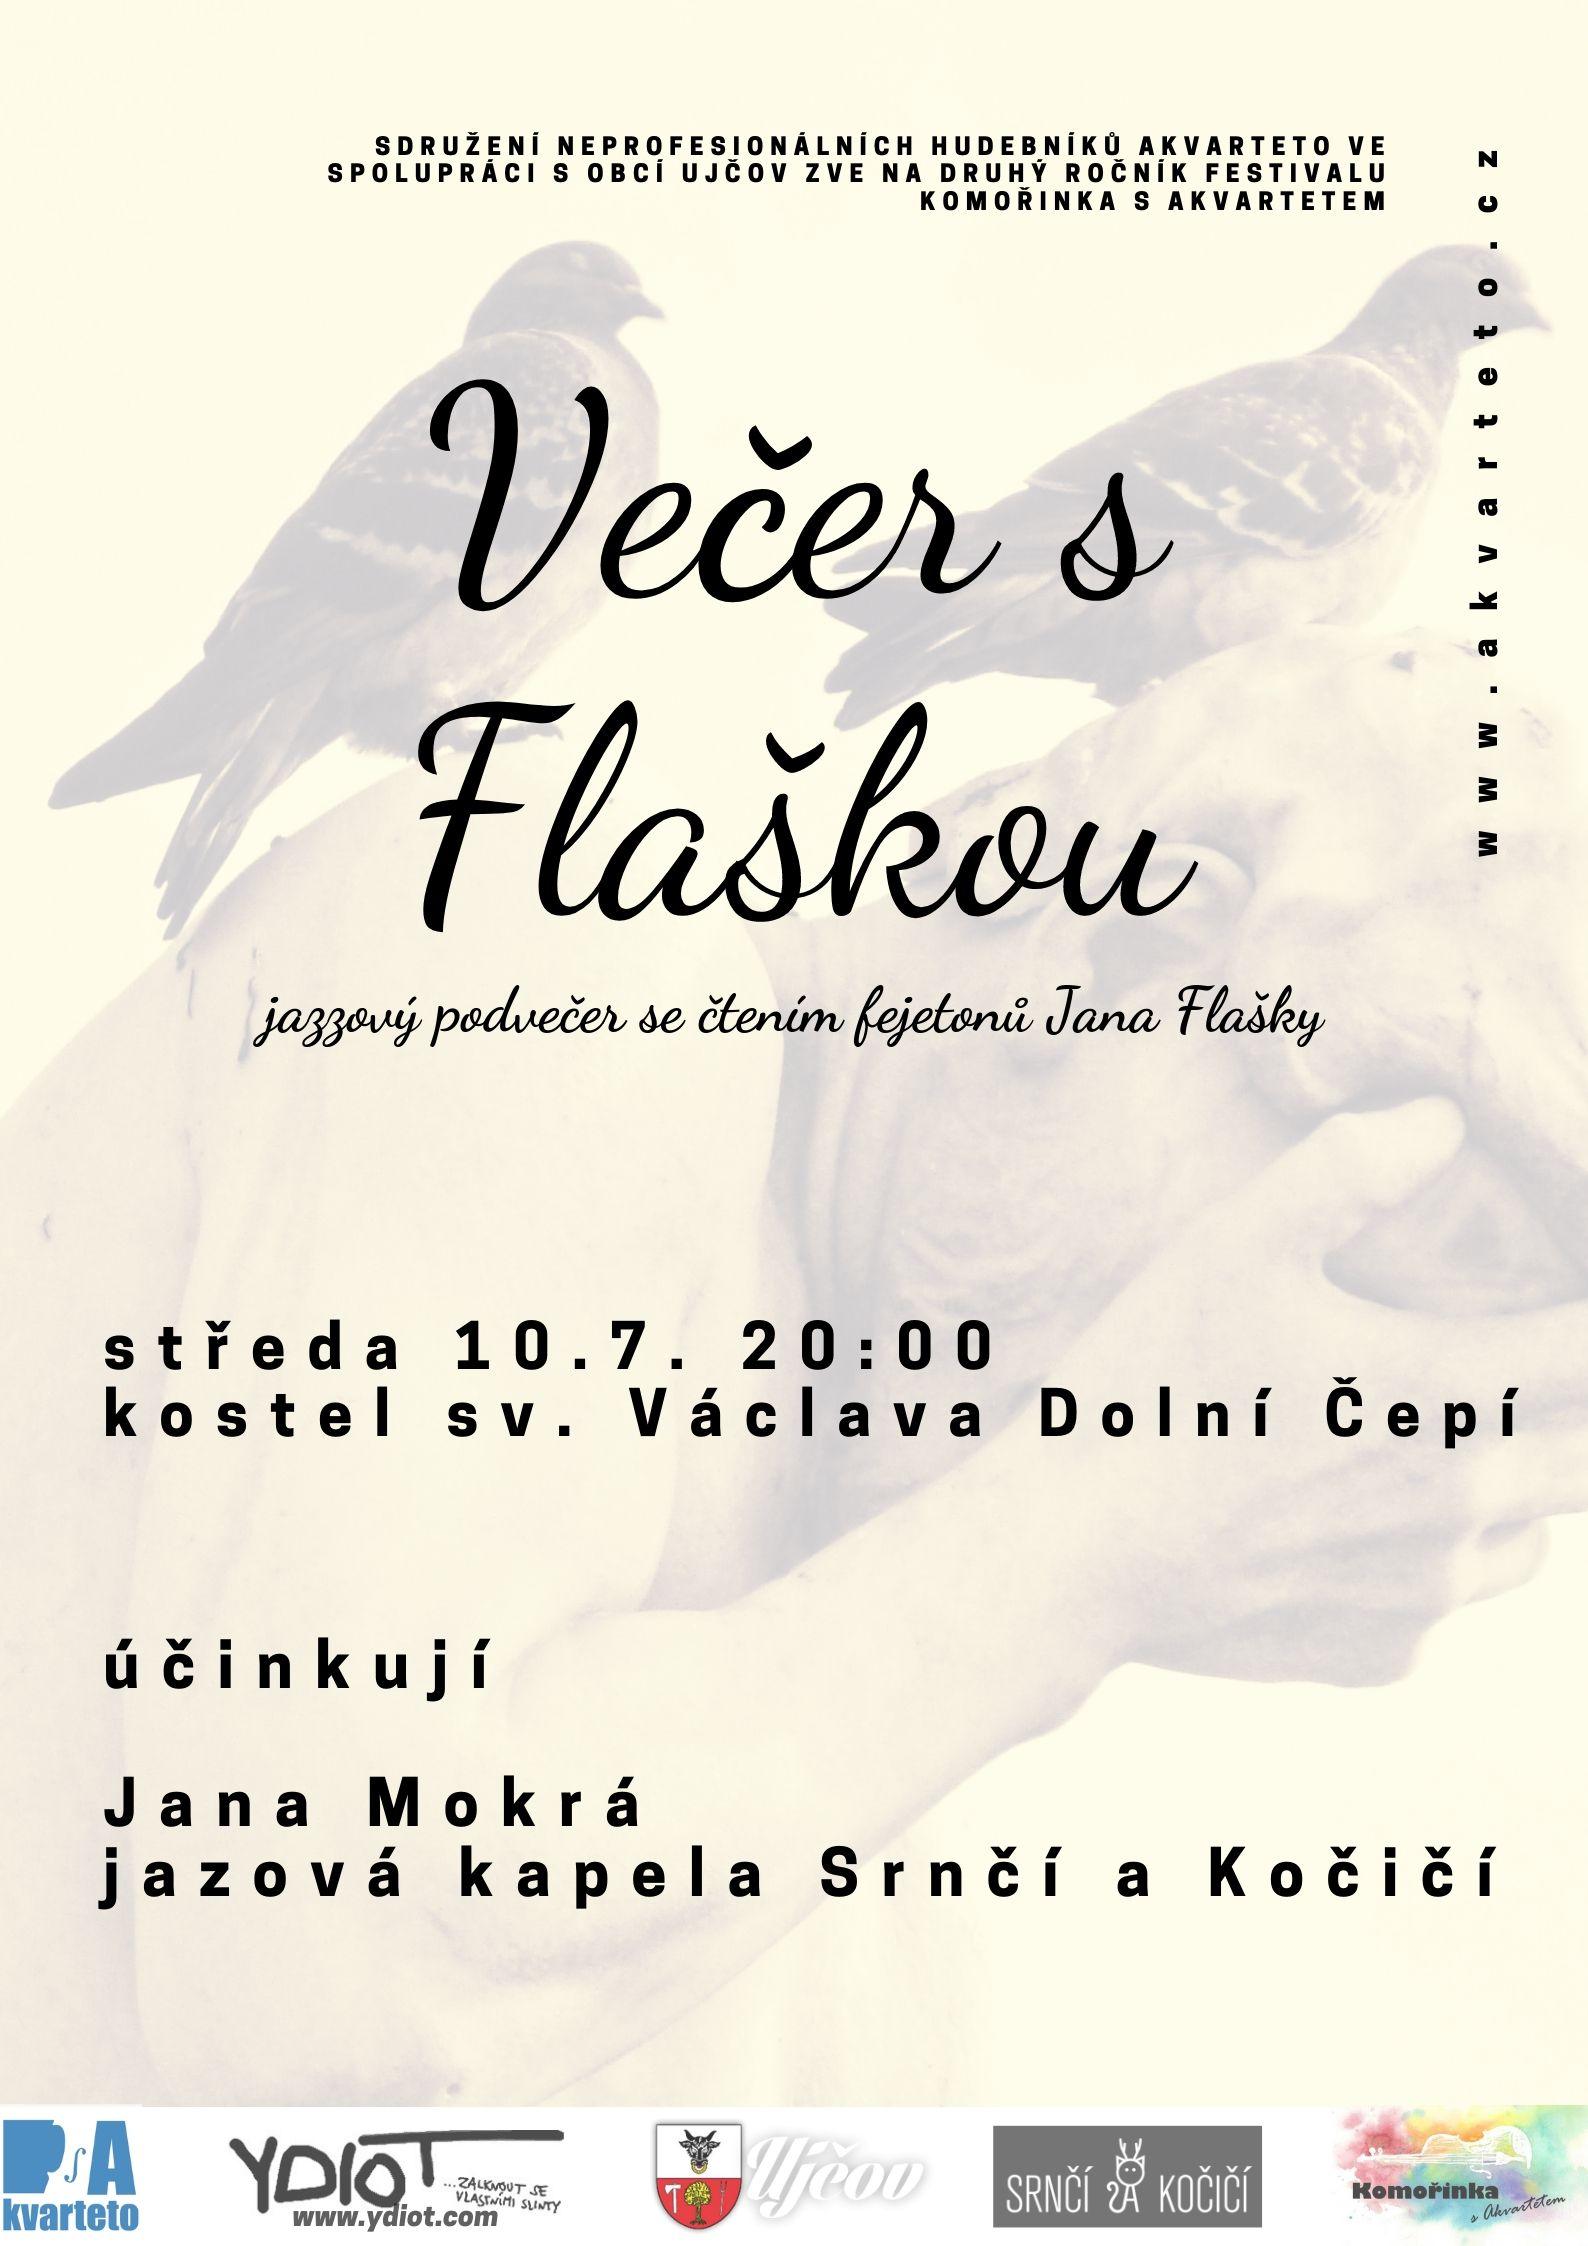 Komořinka s Akvartetem 2019: Večer s Flaškou